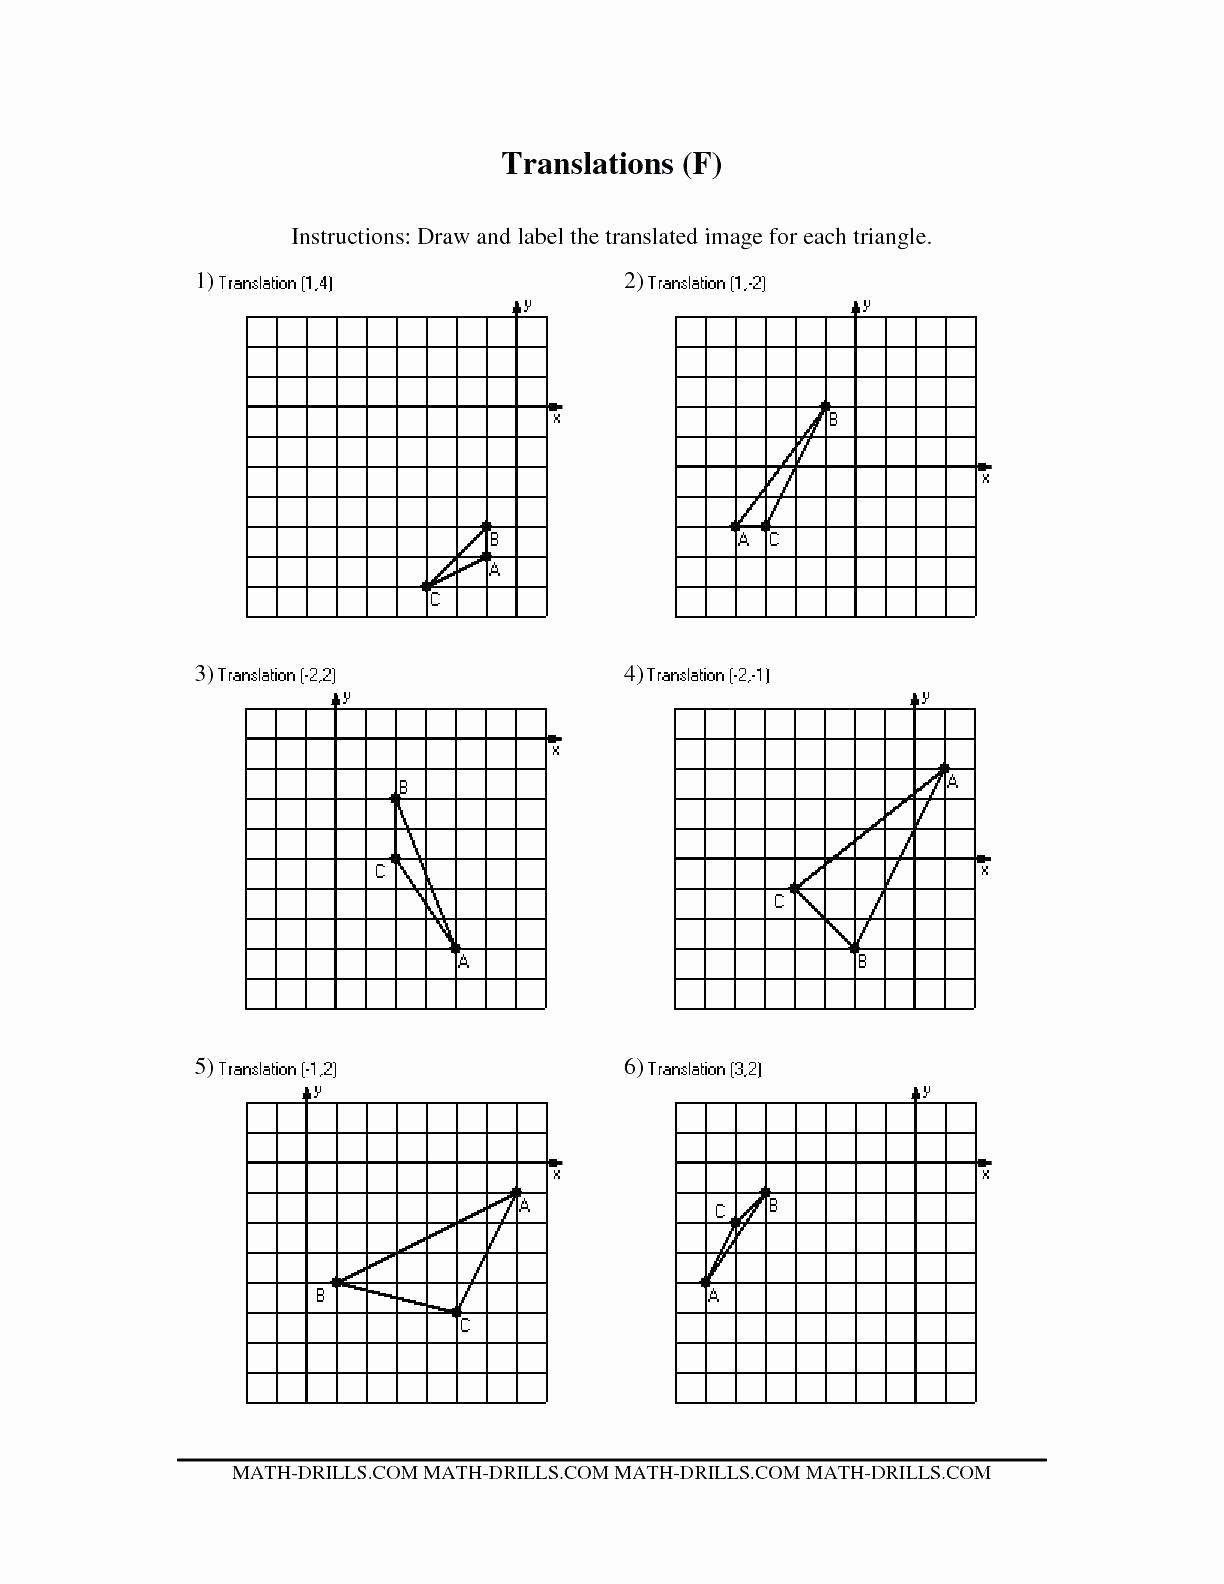 Reflection and Translation Worksheets Fresh Translations Math Worksheets Translate Rotation Reflection